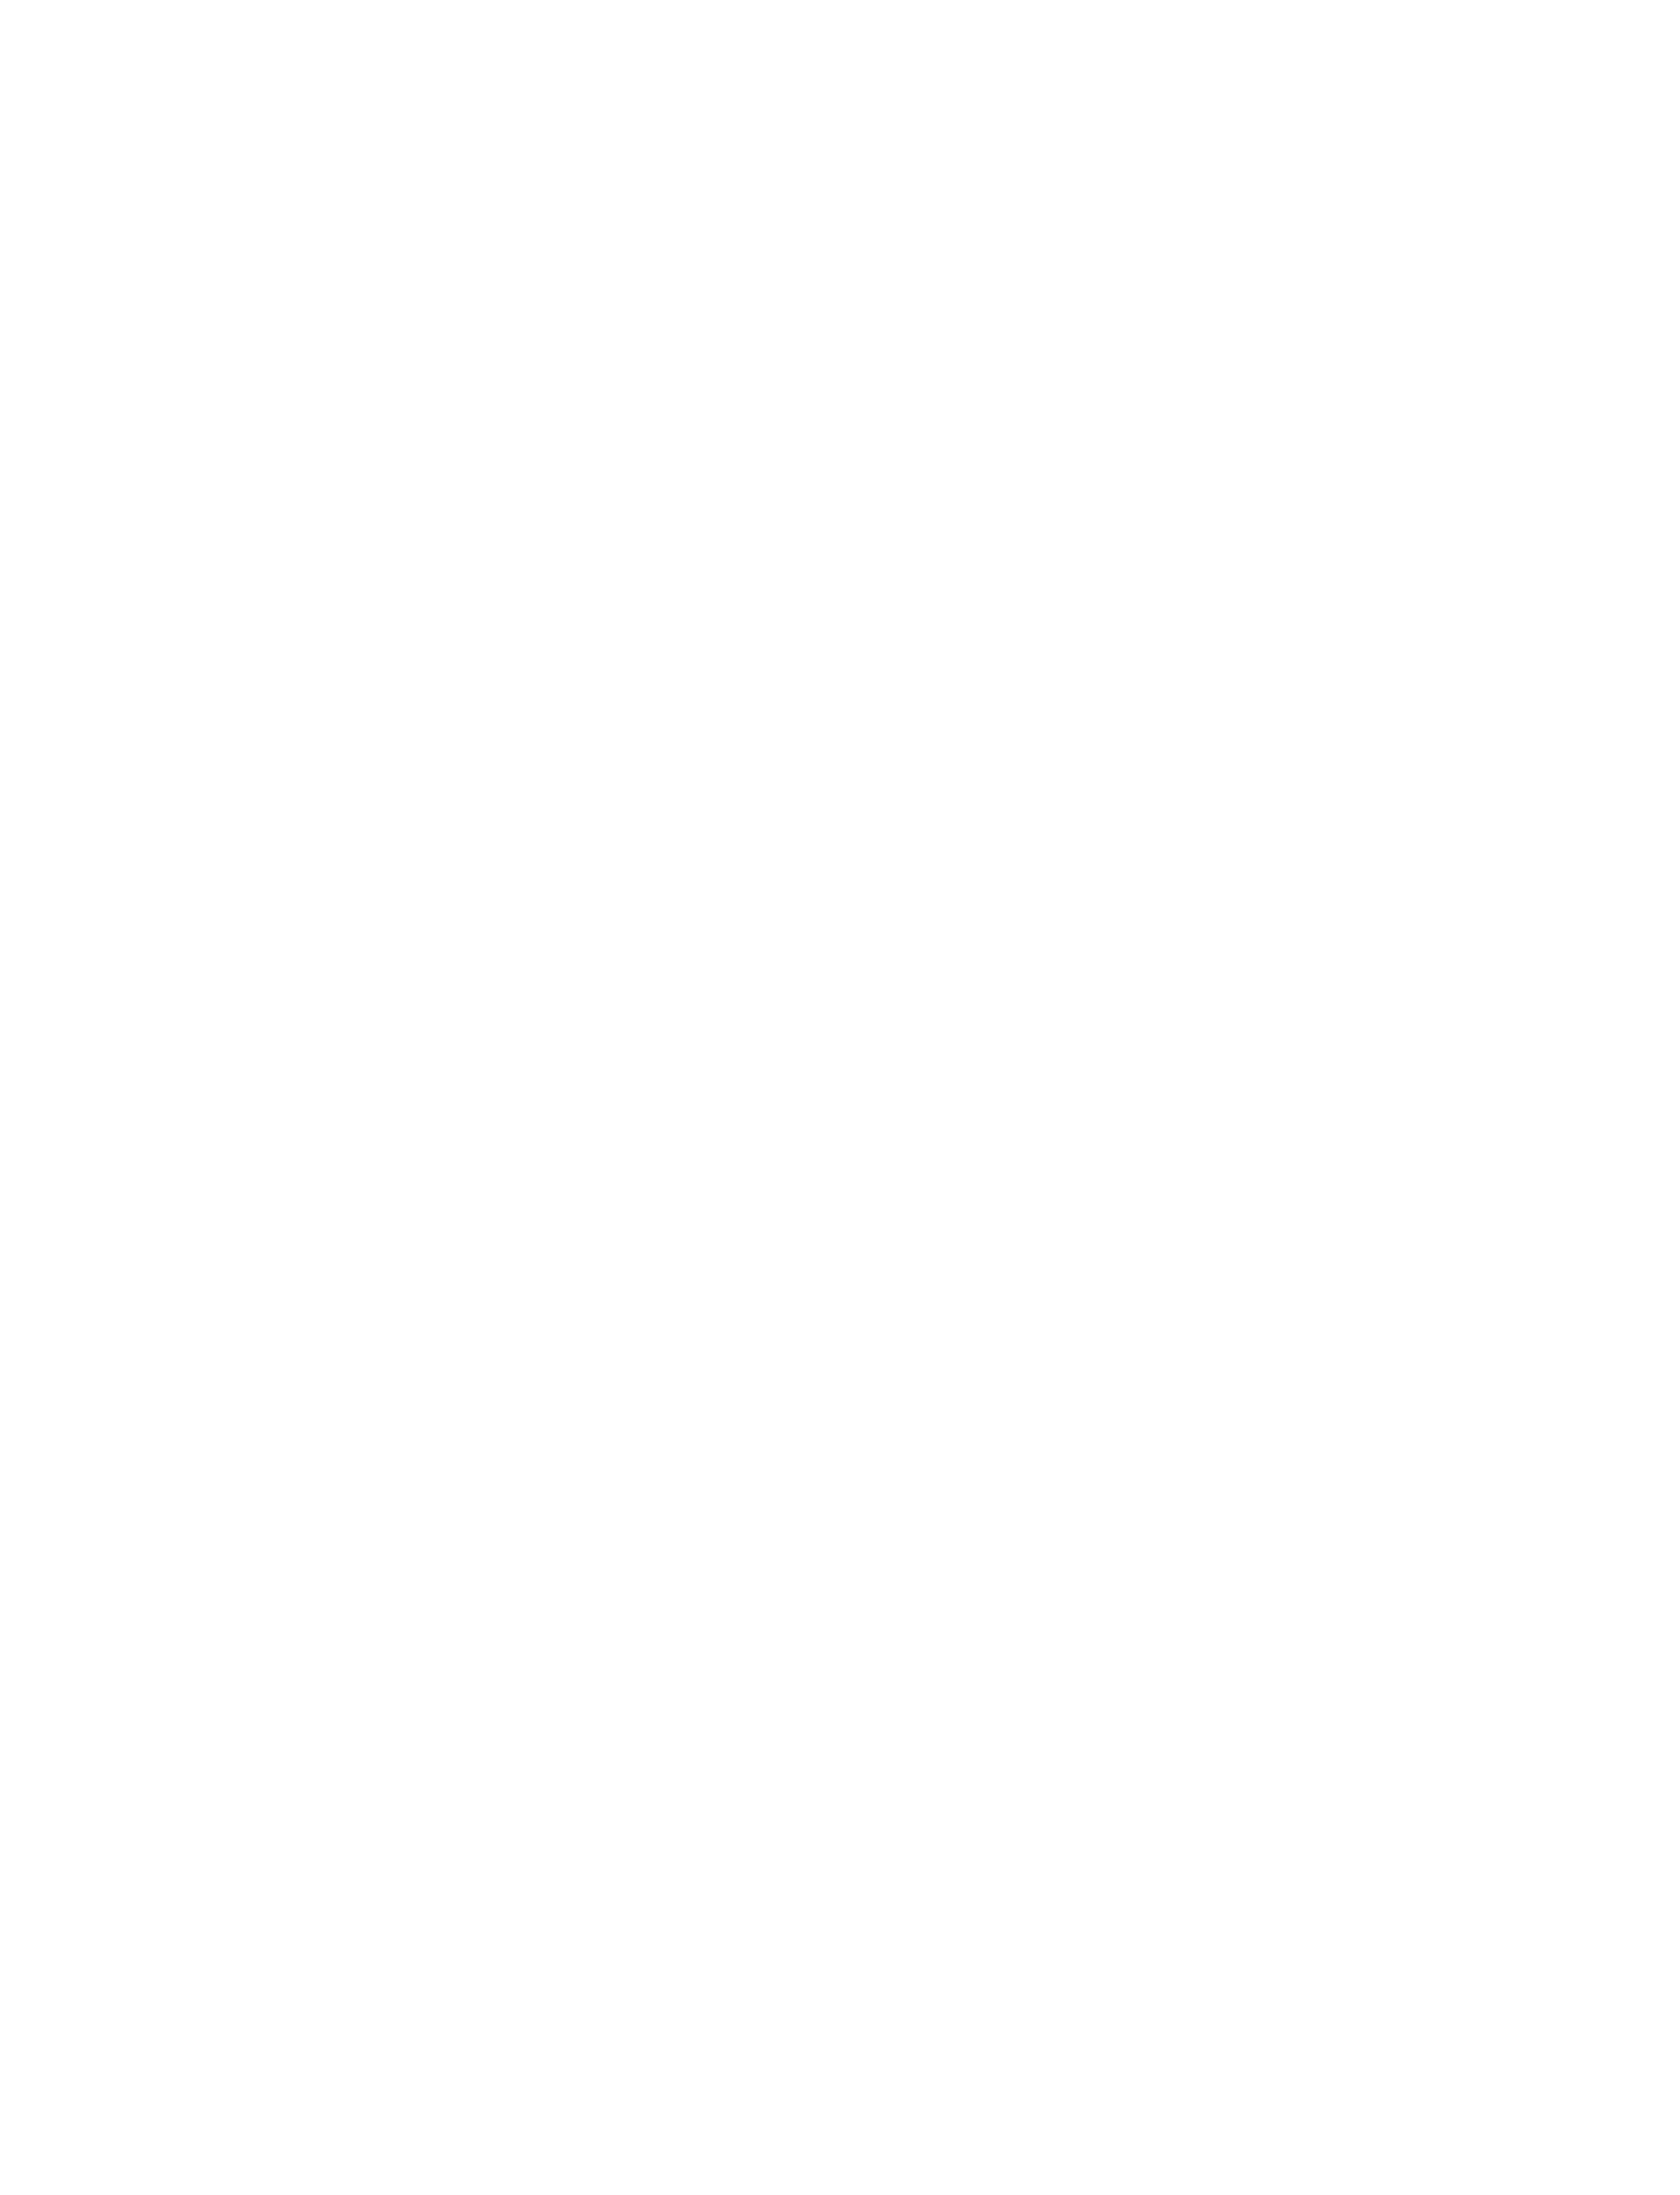 Film clipart audio video. Reactor films a production